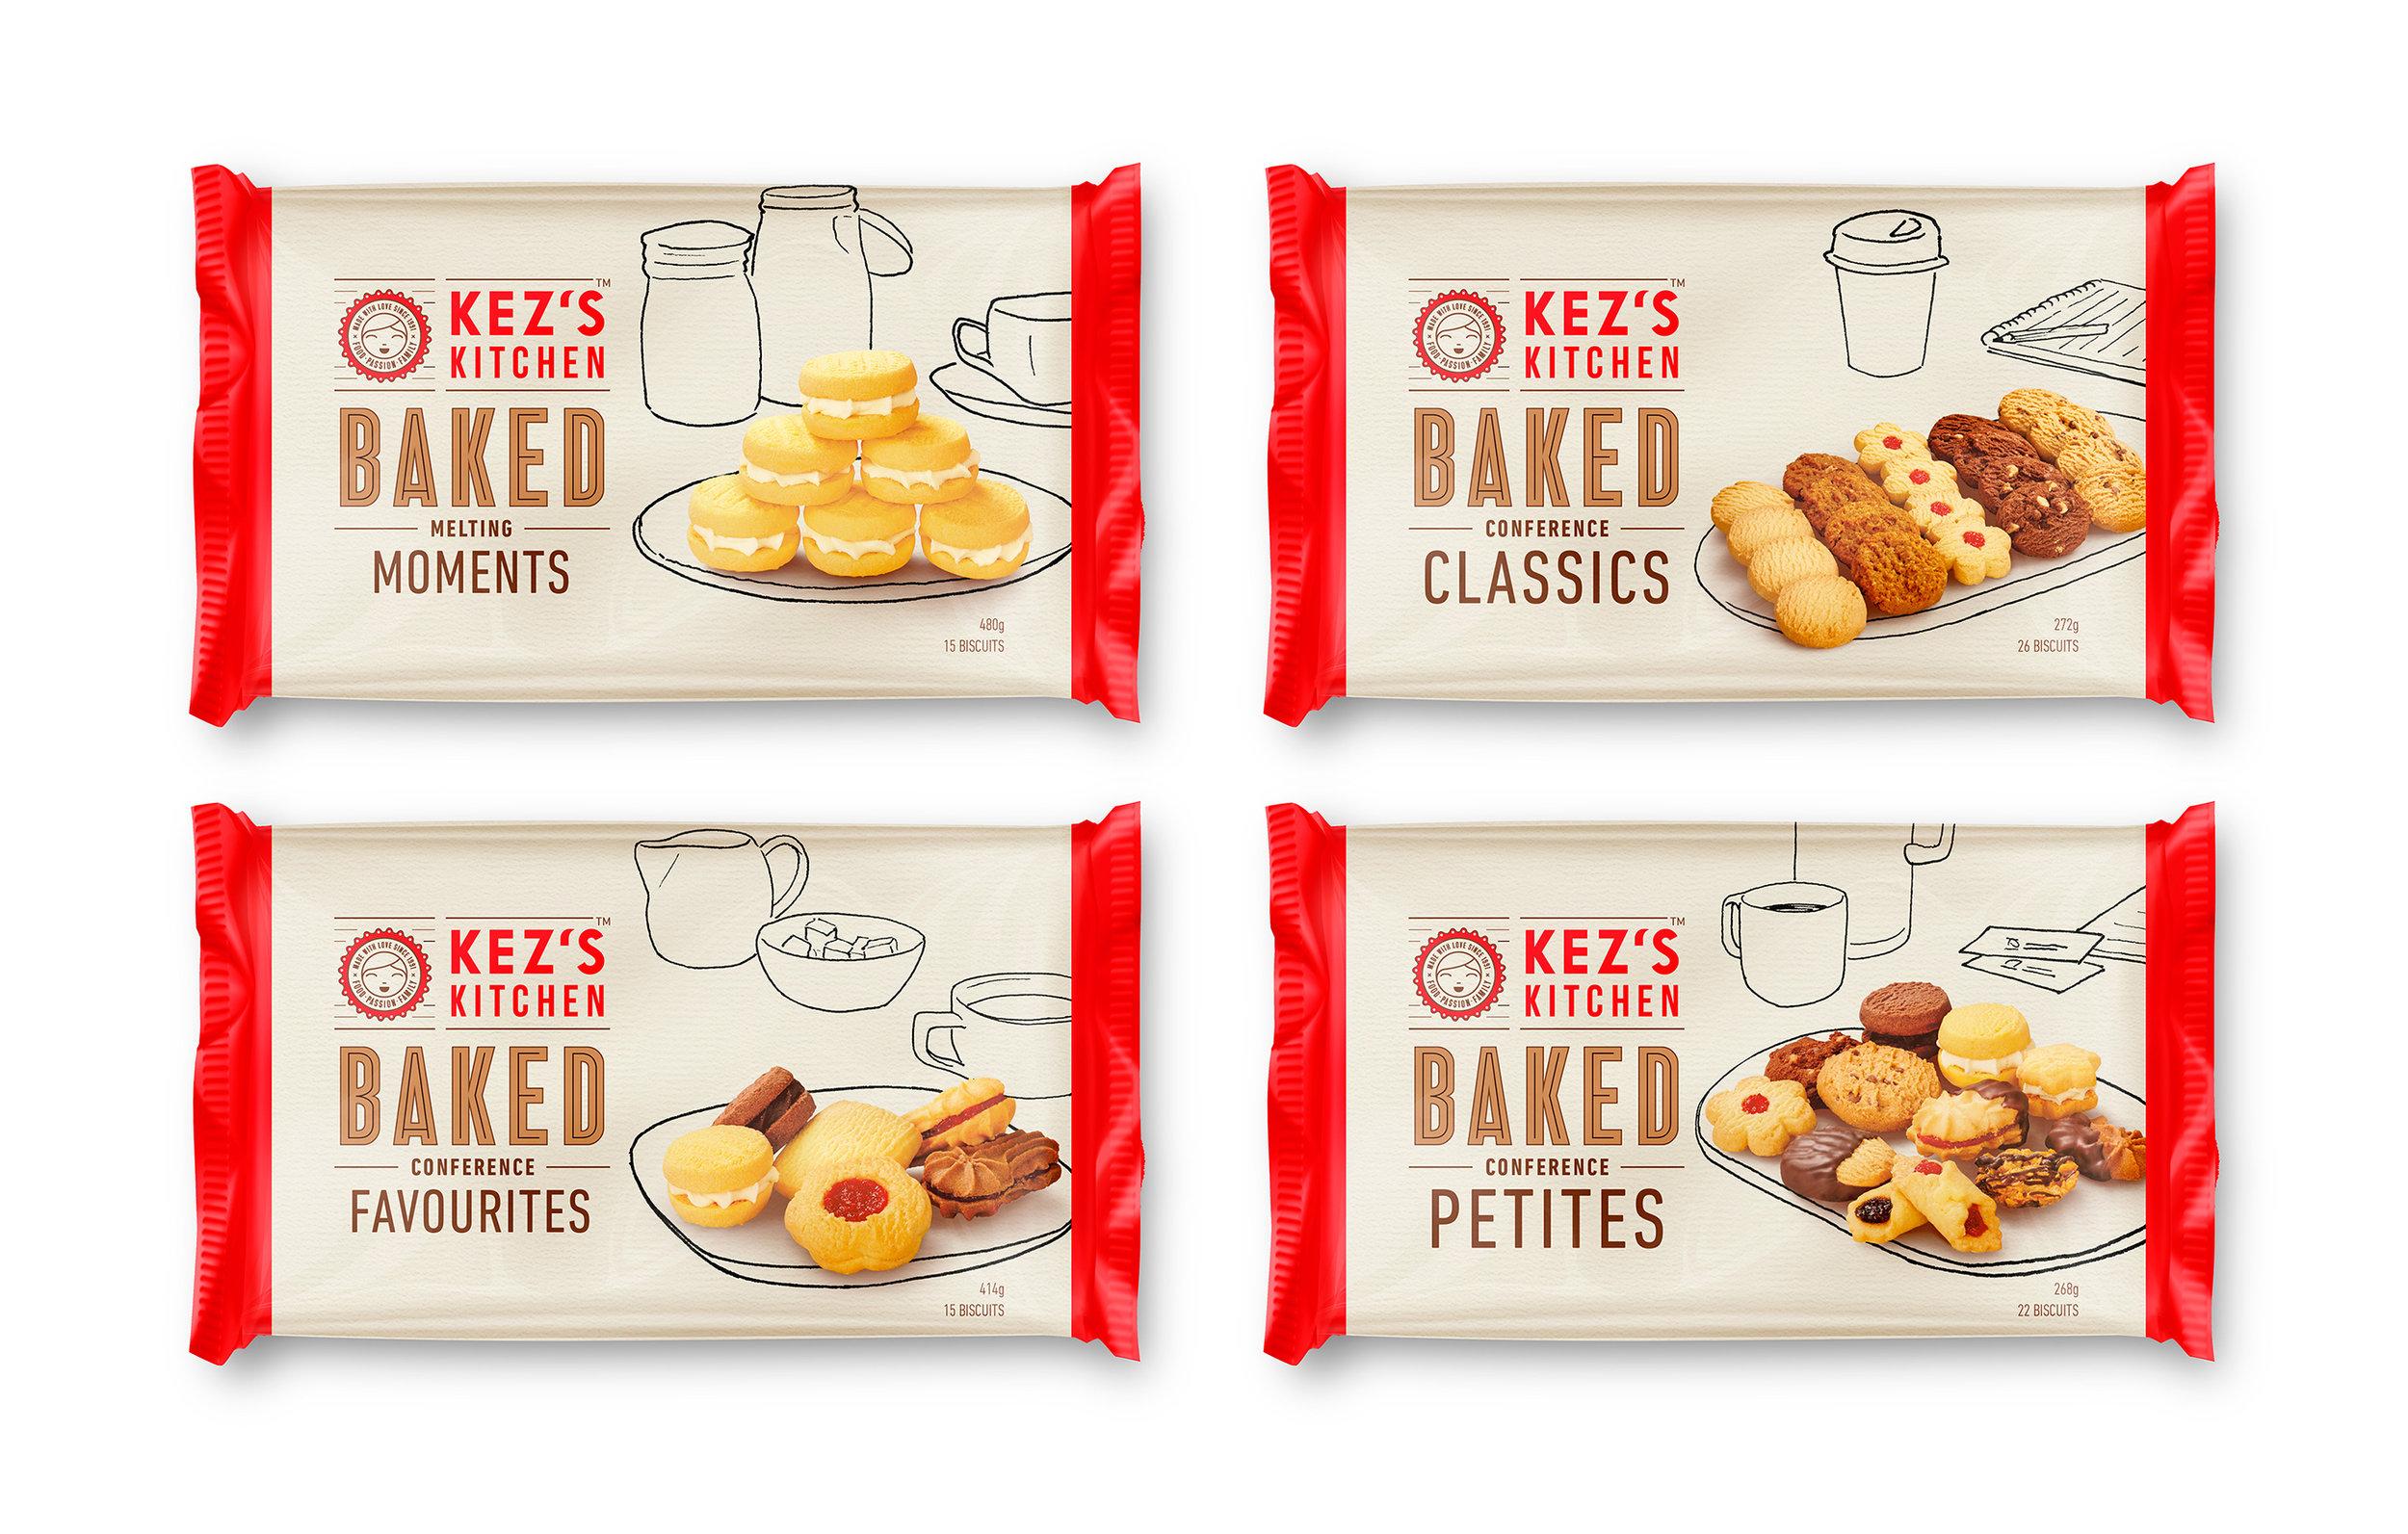 PROJECT - Kez's Kitchen — Asprey Creative